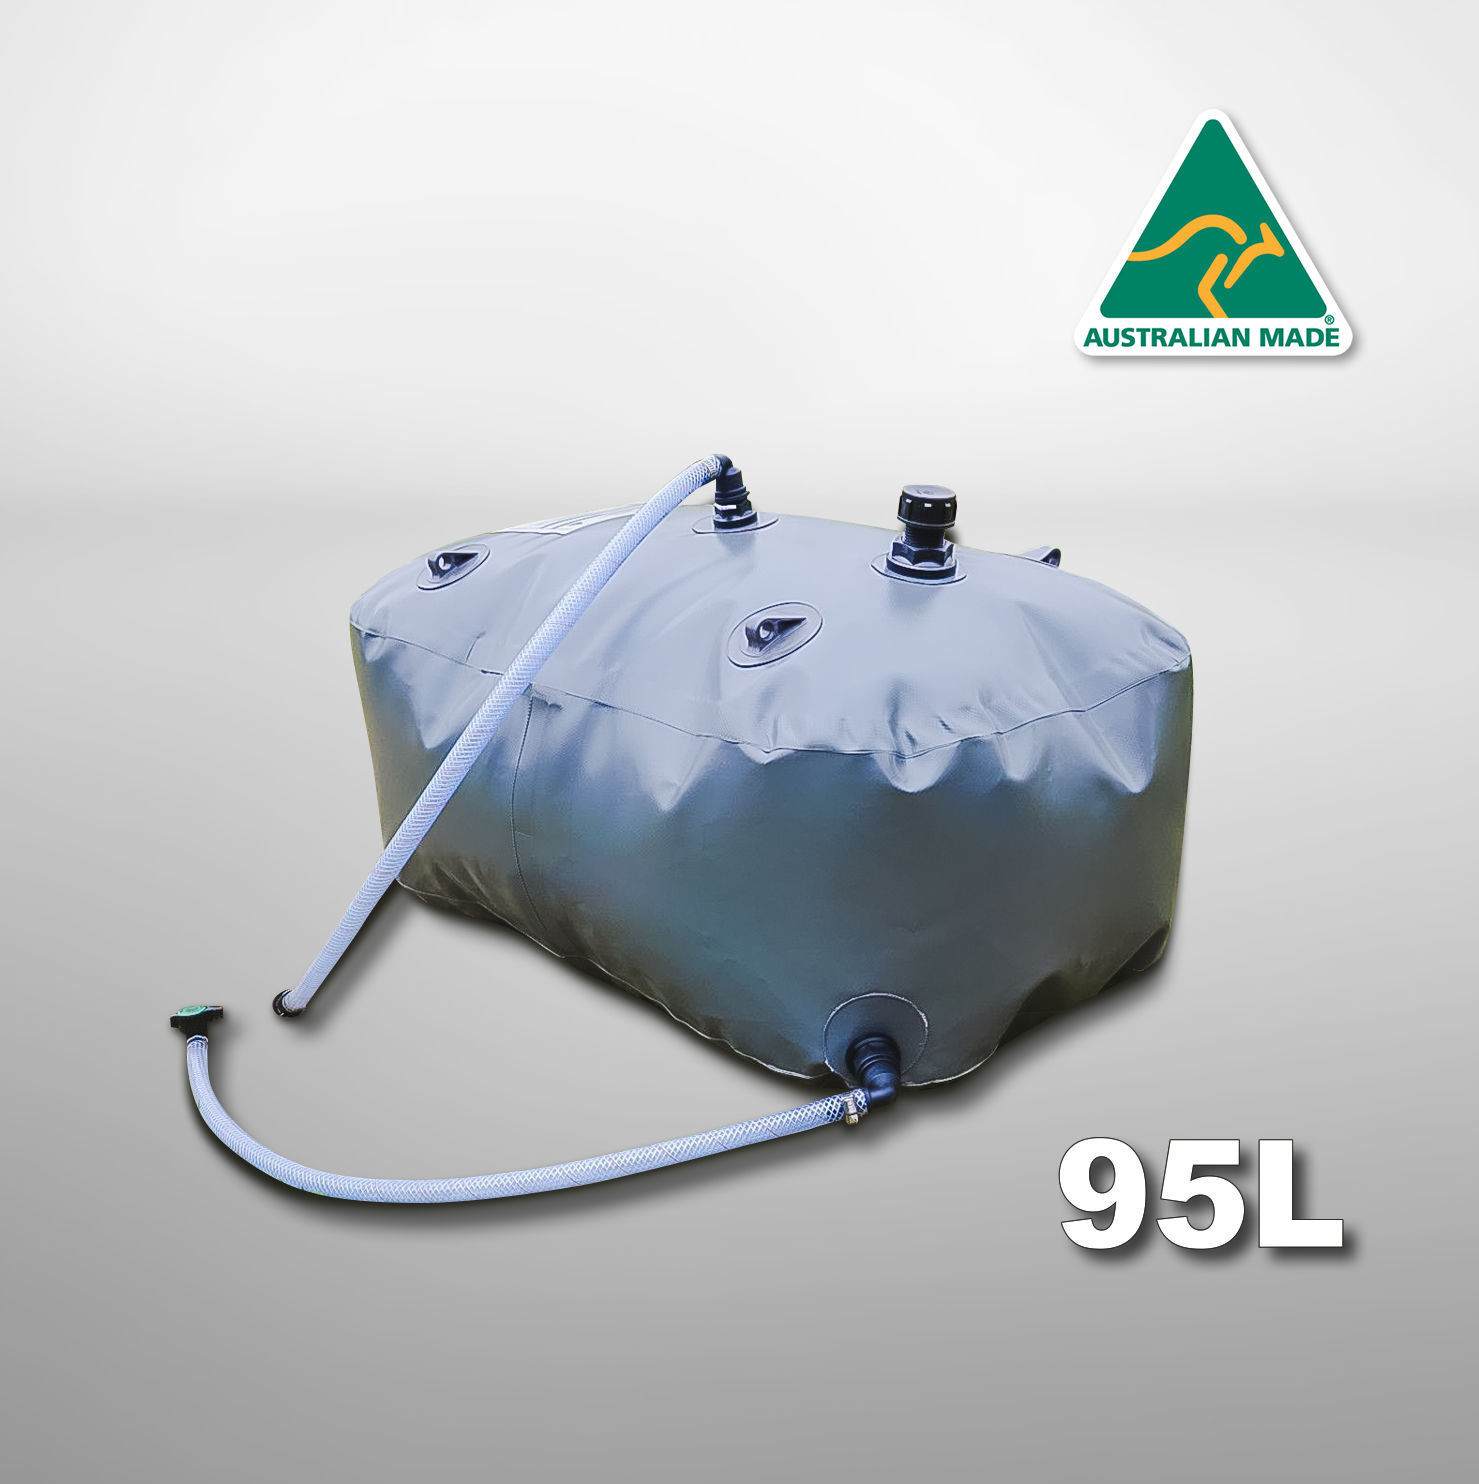 Water bladder tank tank tank 25 Gallon (95L) for Mitsubishi Pajeros' 3rd row seat well 38c40c